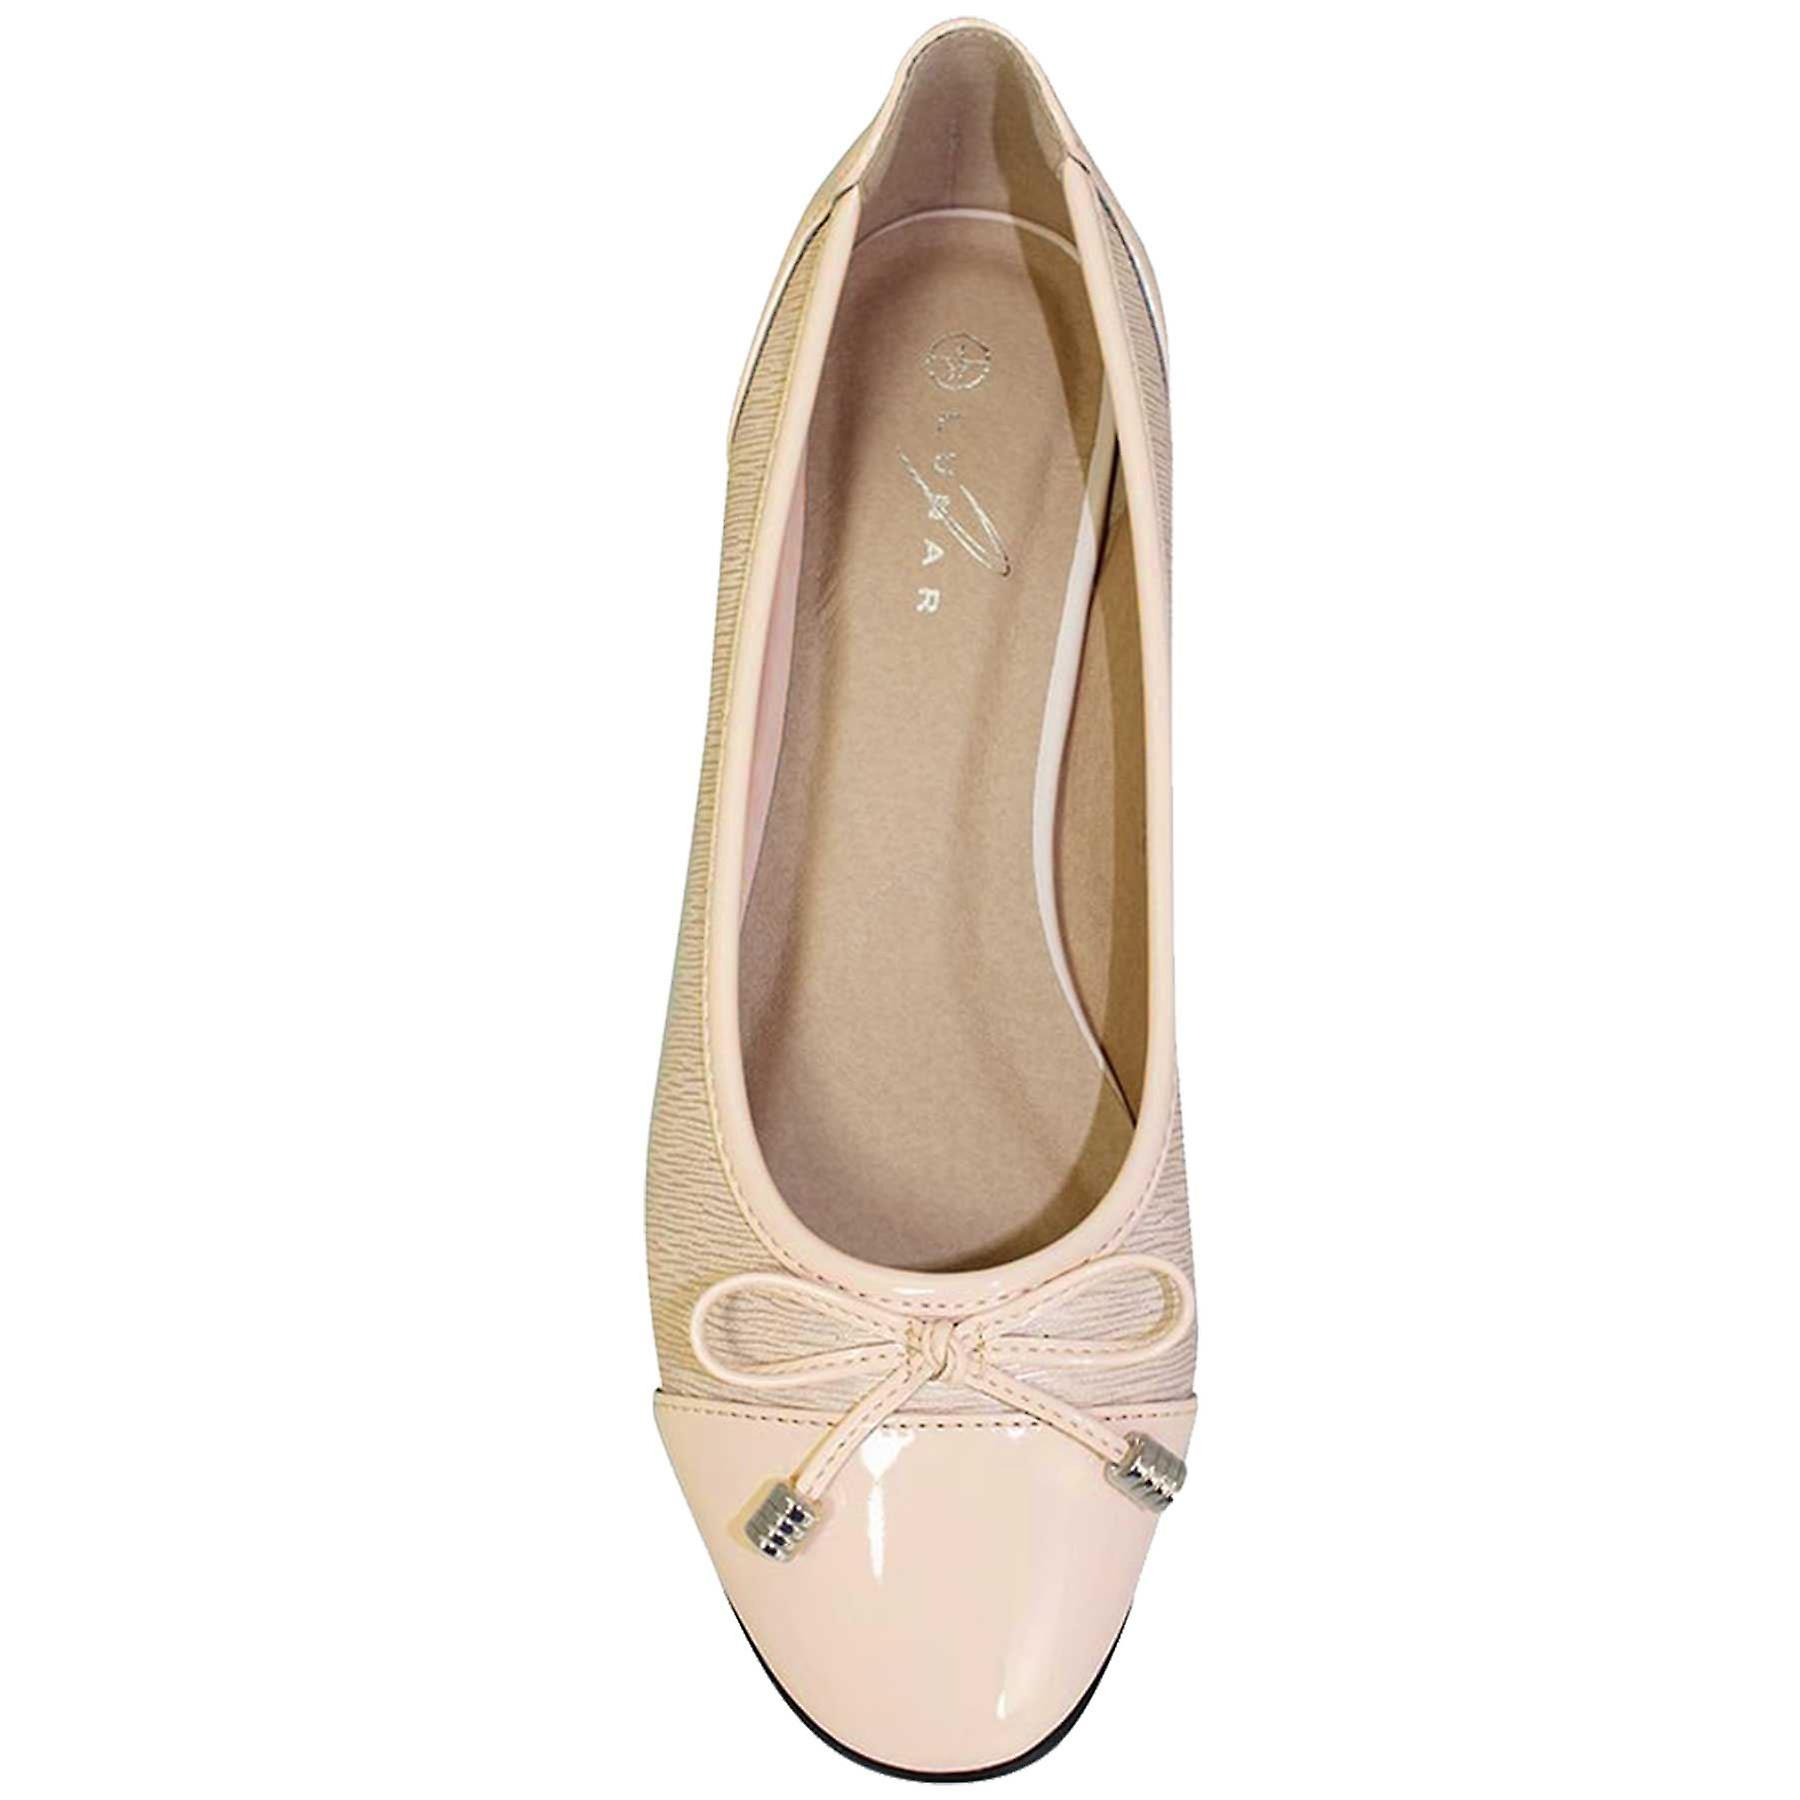 FLC006 Valencia Ladies Bow Accent Patent Smart Casual Pumps Flats Dolly Shoes jsajp